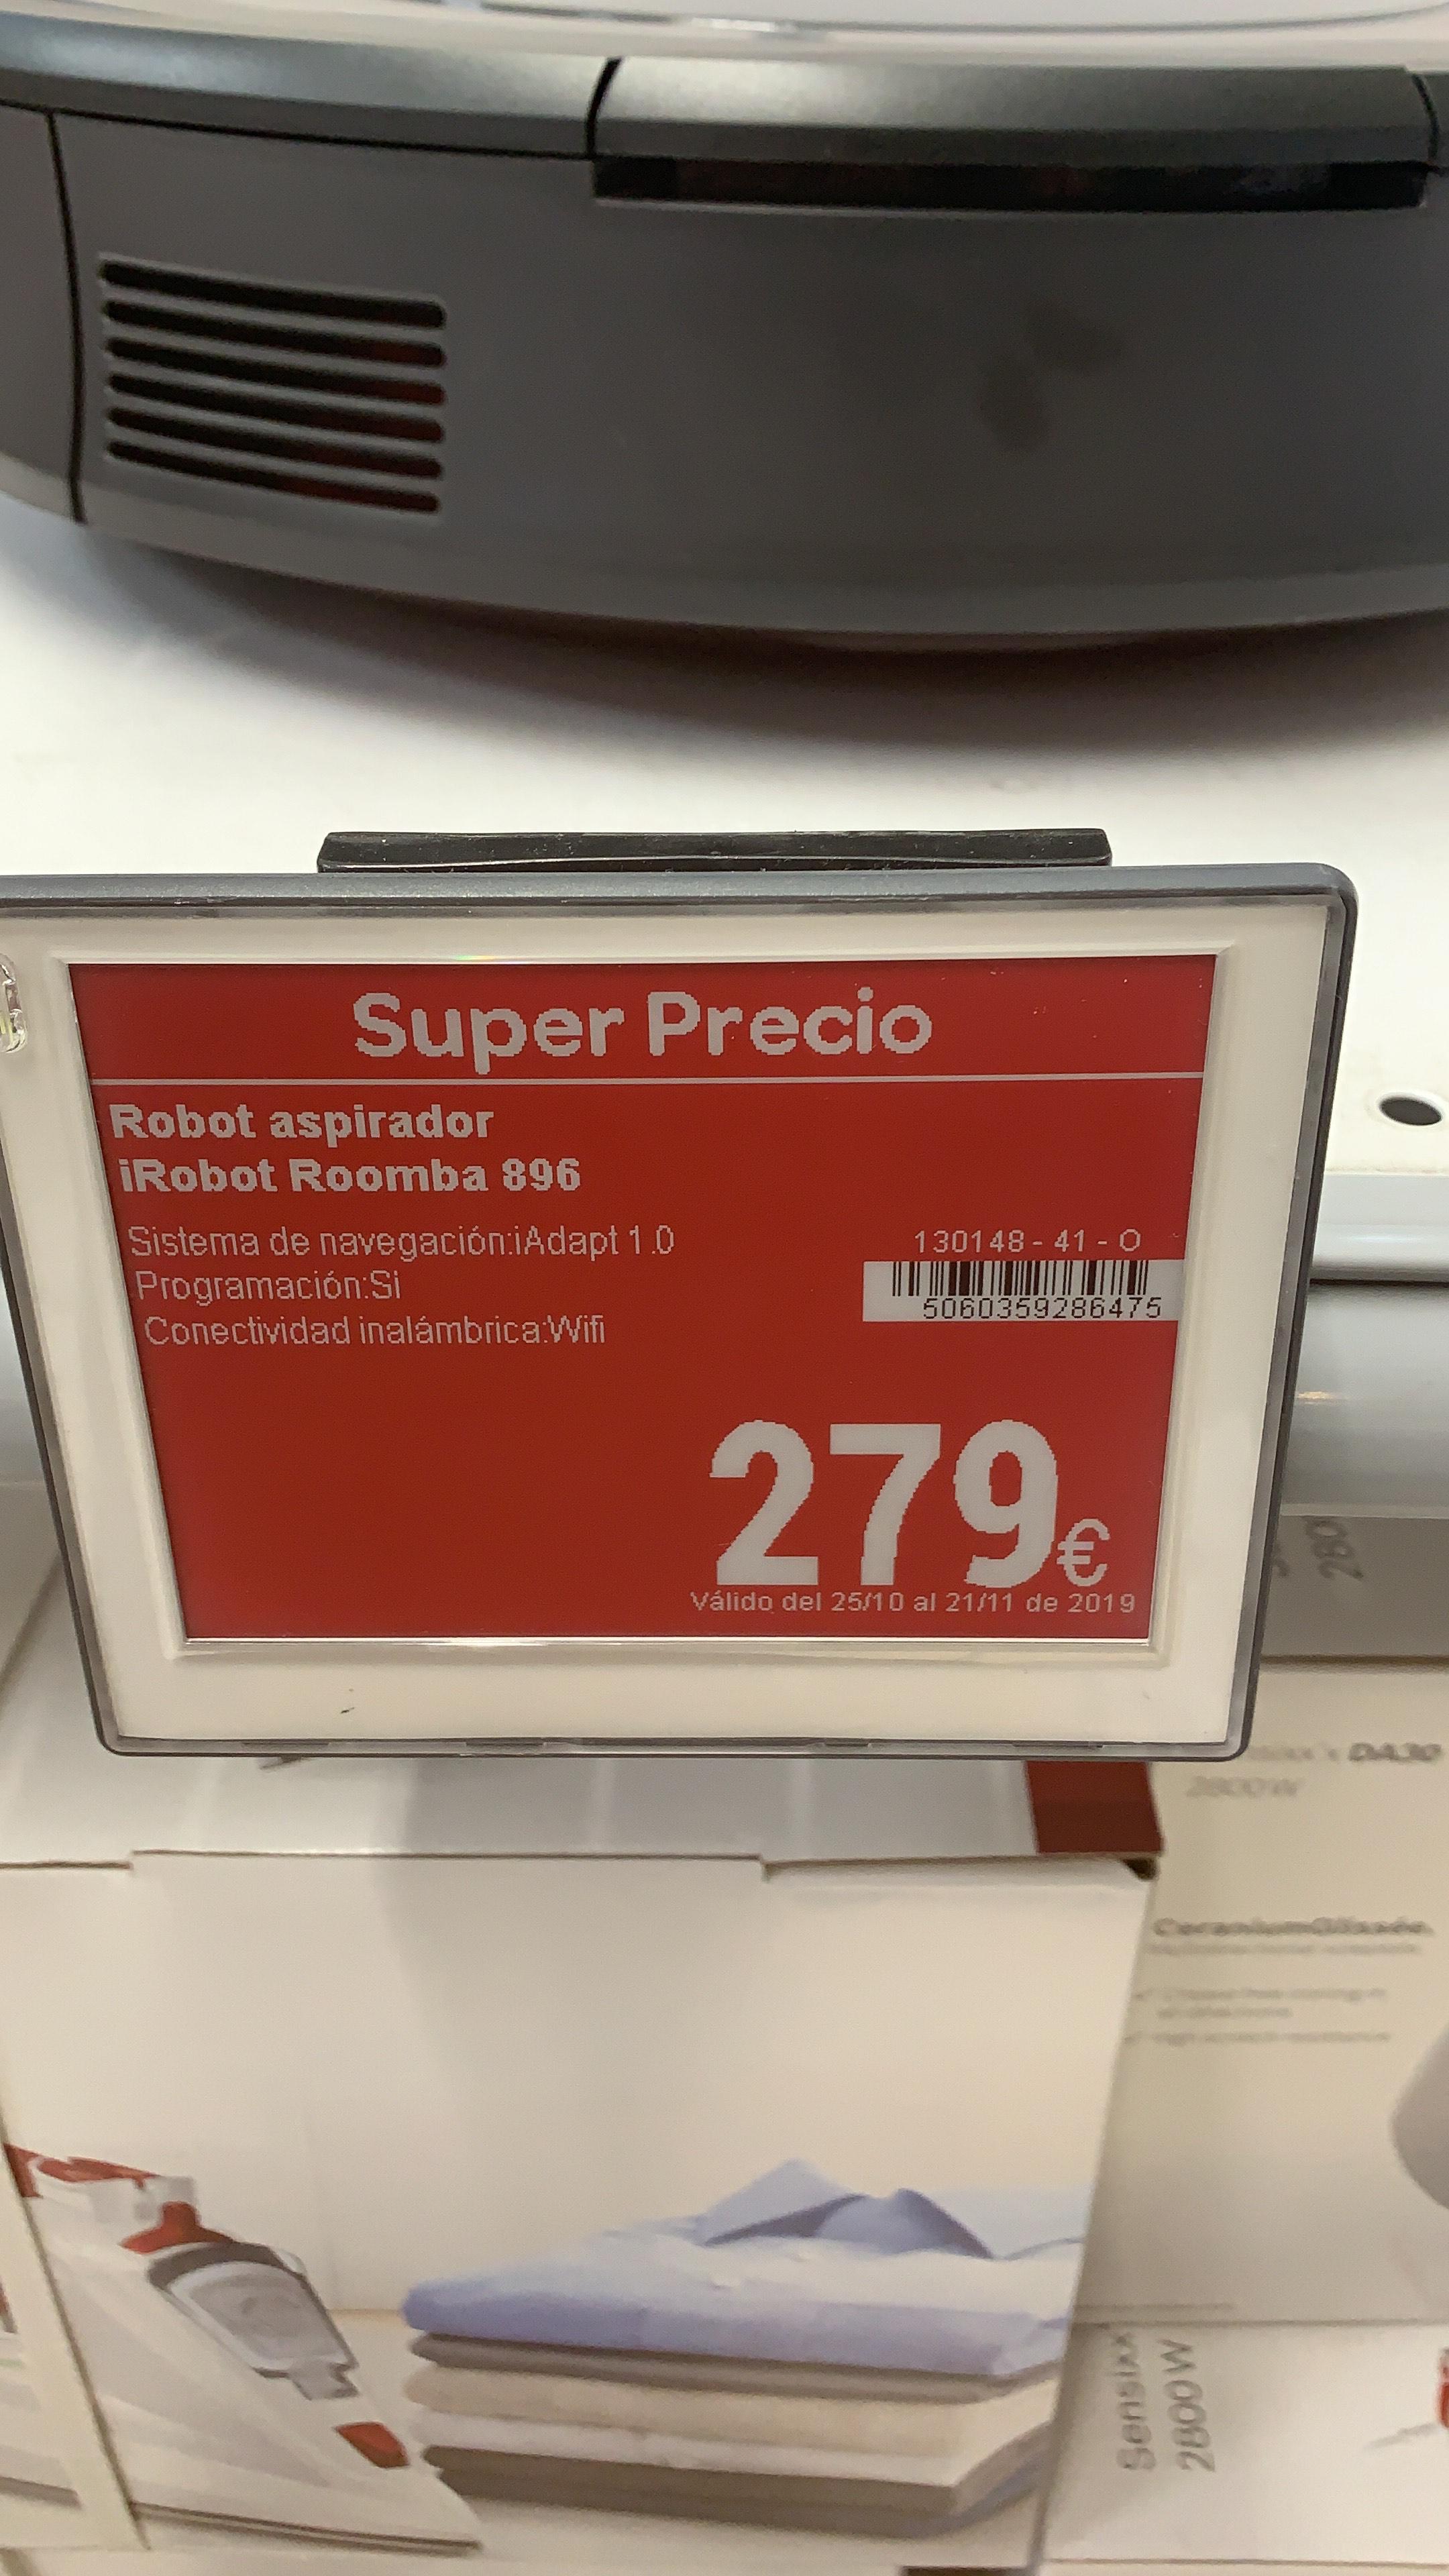 Roomba 896 (Carrefour san fernando de henares)